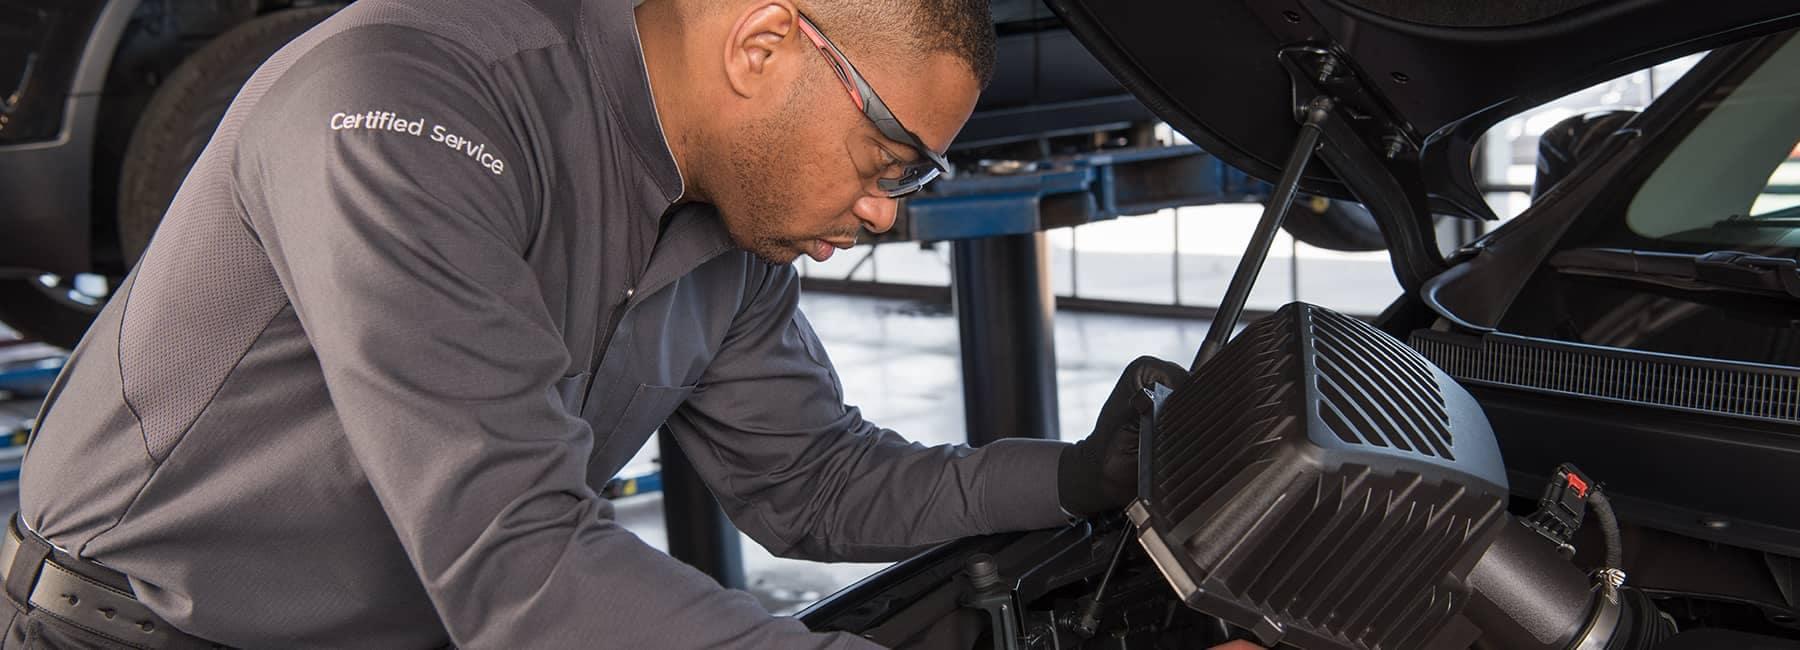 Certified technician inspects car engine